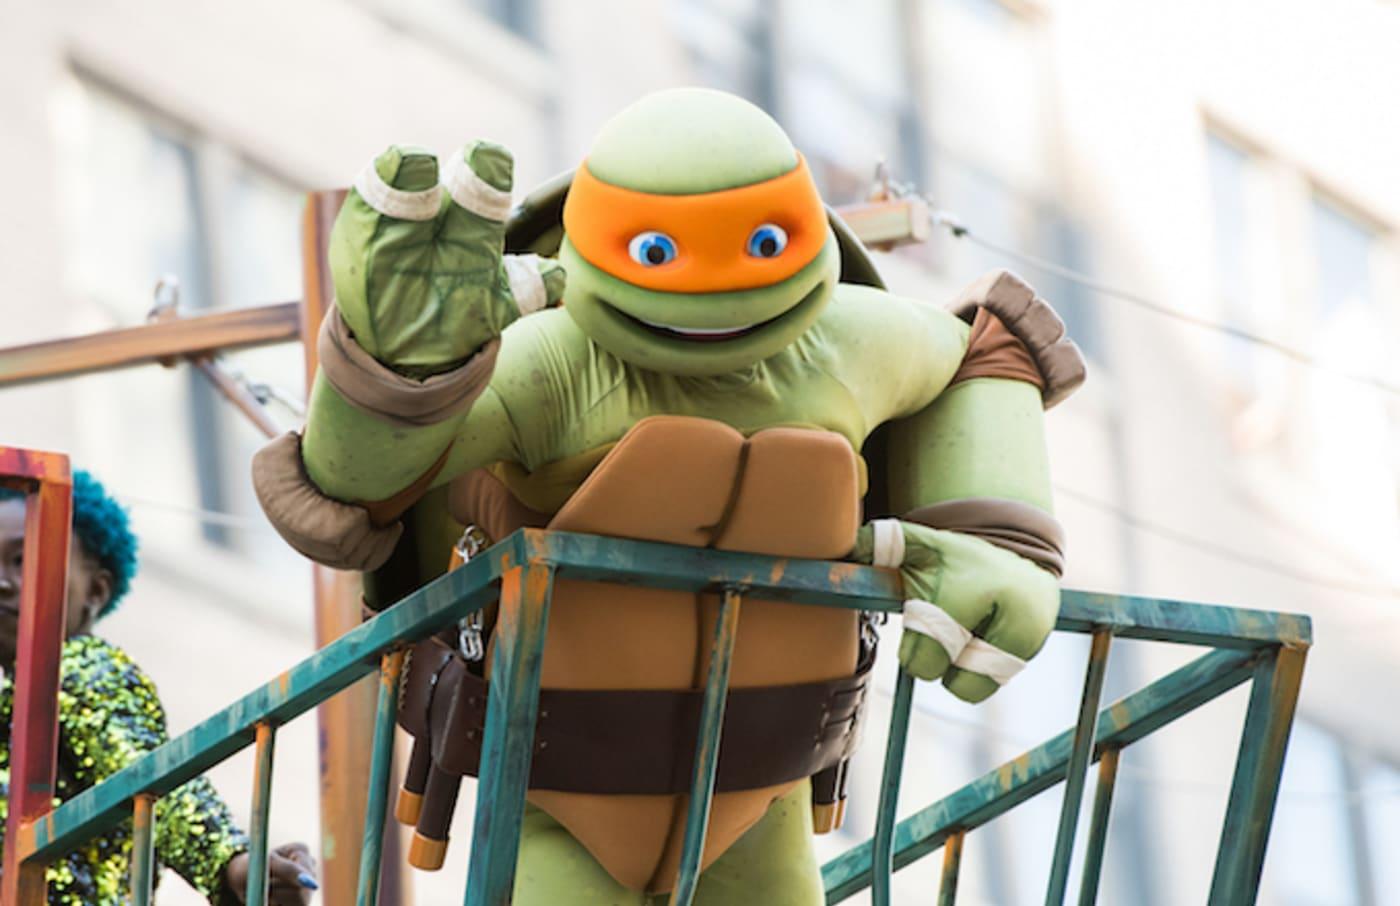 Michelangelo of Teenage Mutant Ninja Turtles